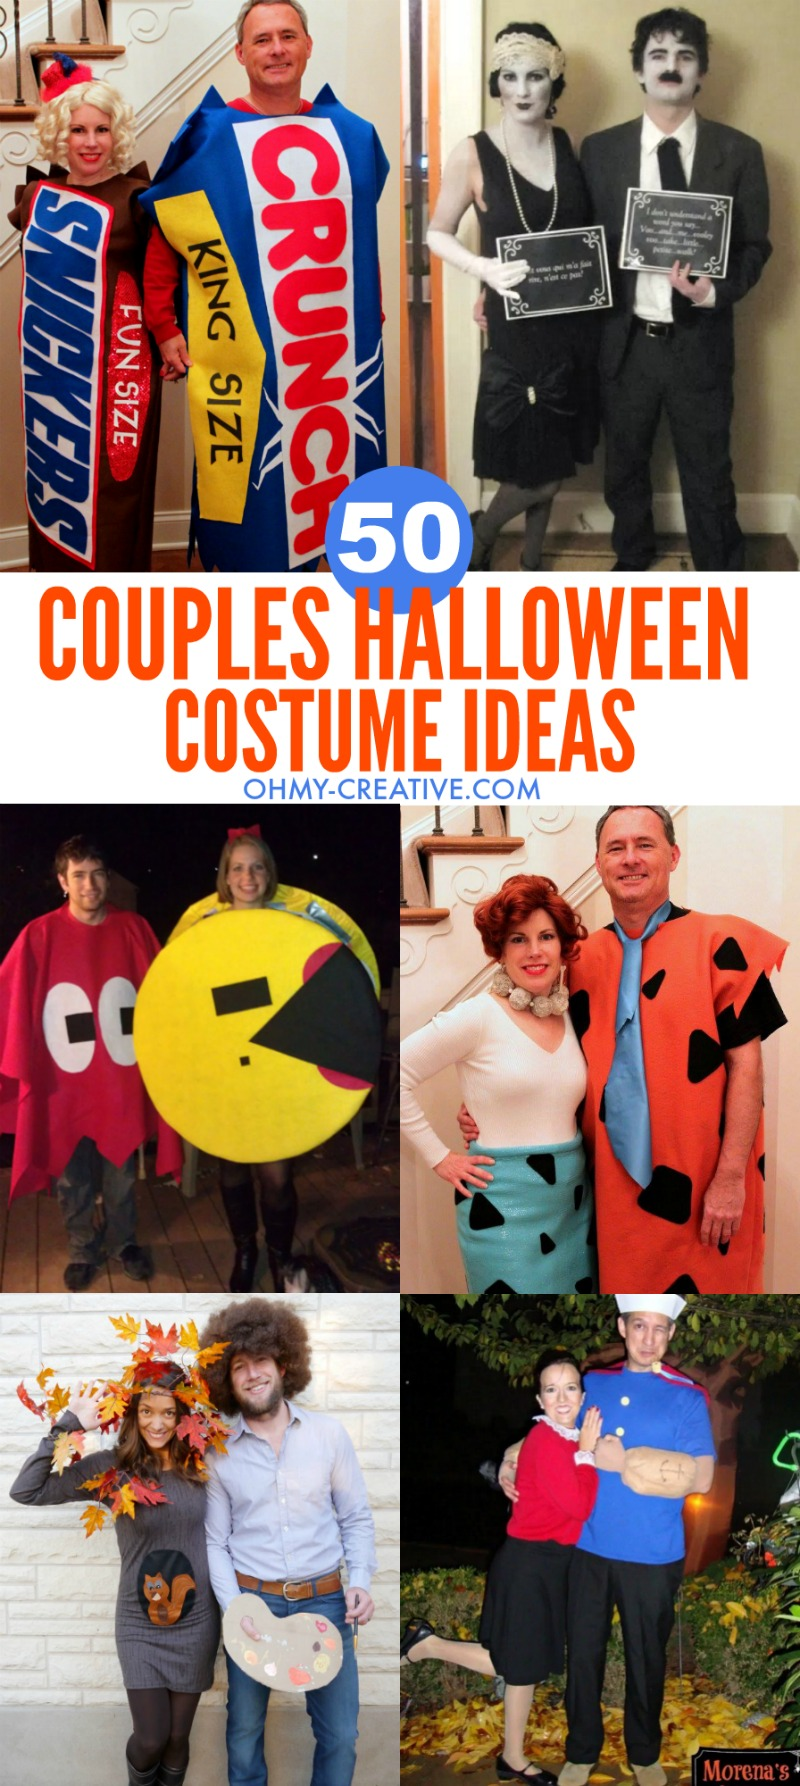 50 Couples Halloween Costume Ideas 2020